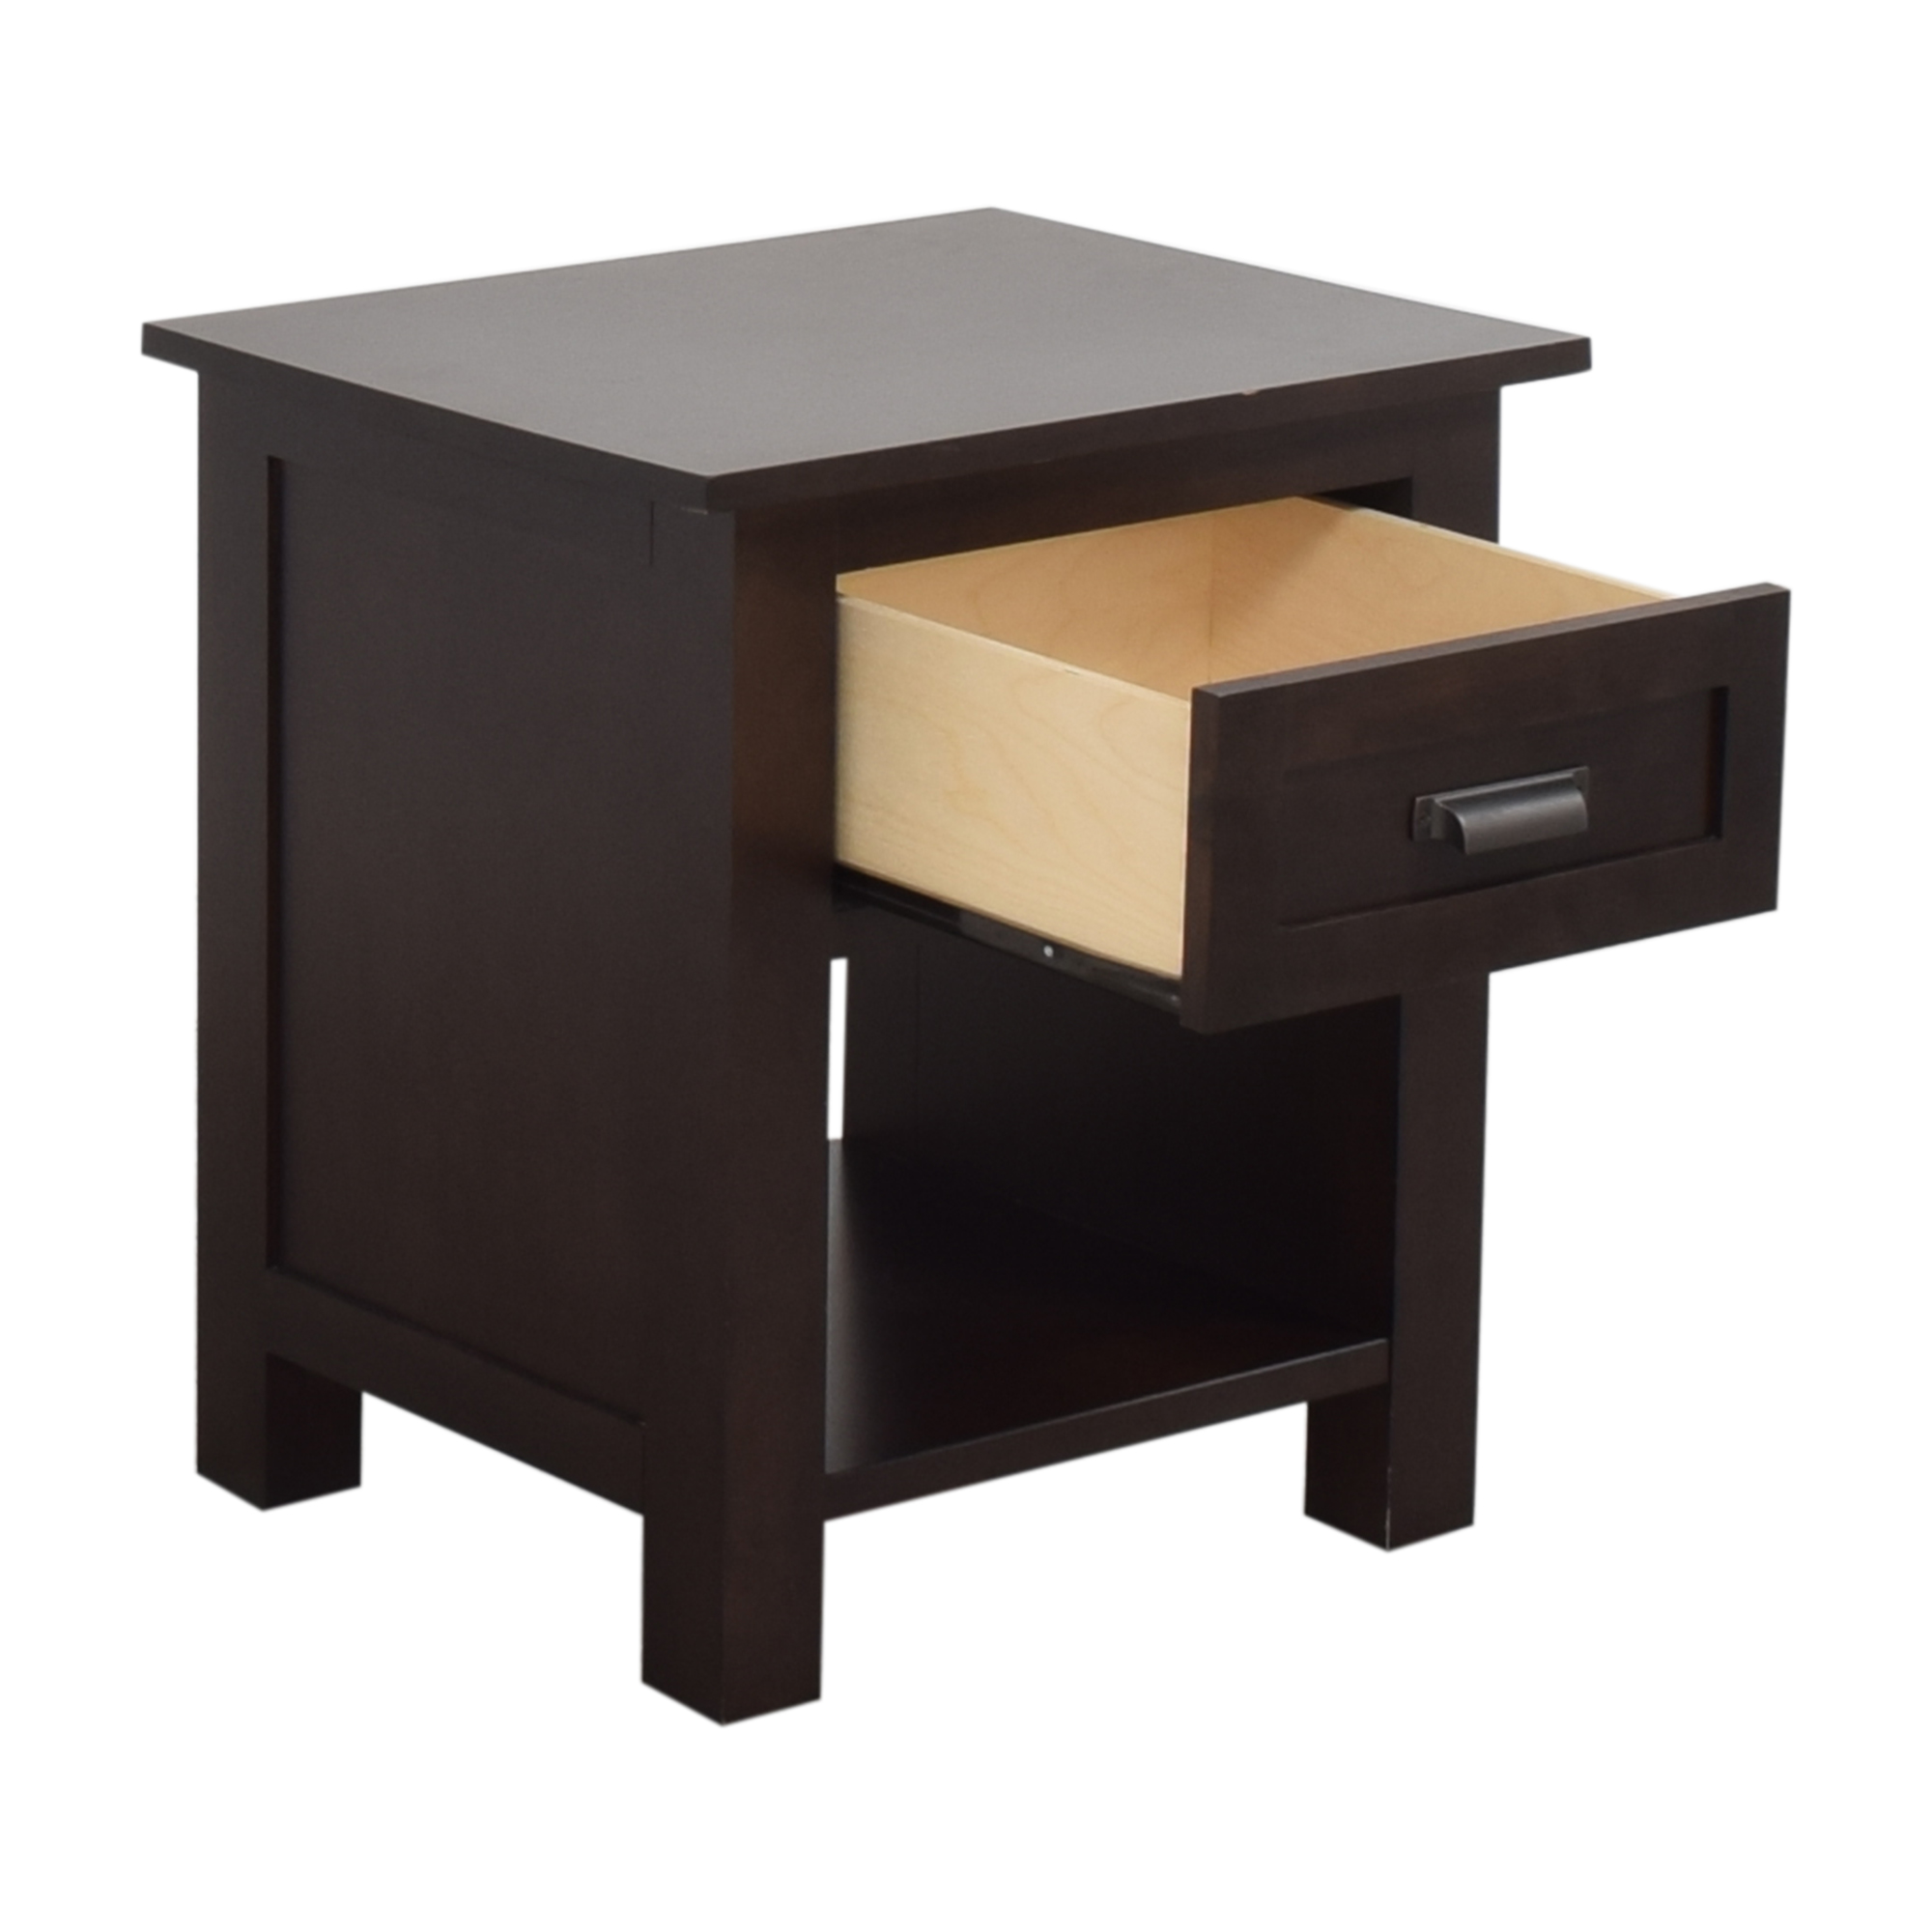 Room & Board Room & Board Bennett One Drawer Nightstand second hand